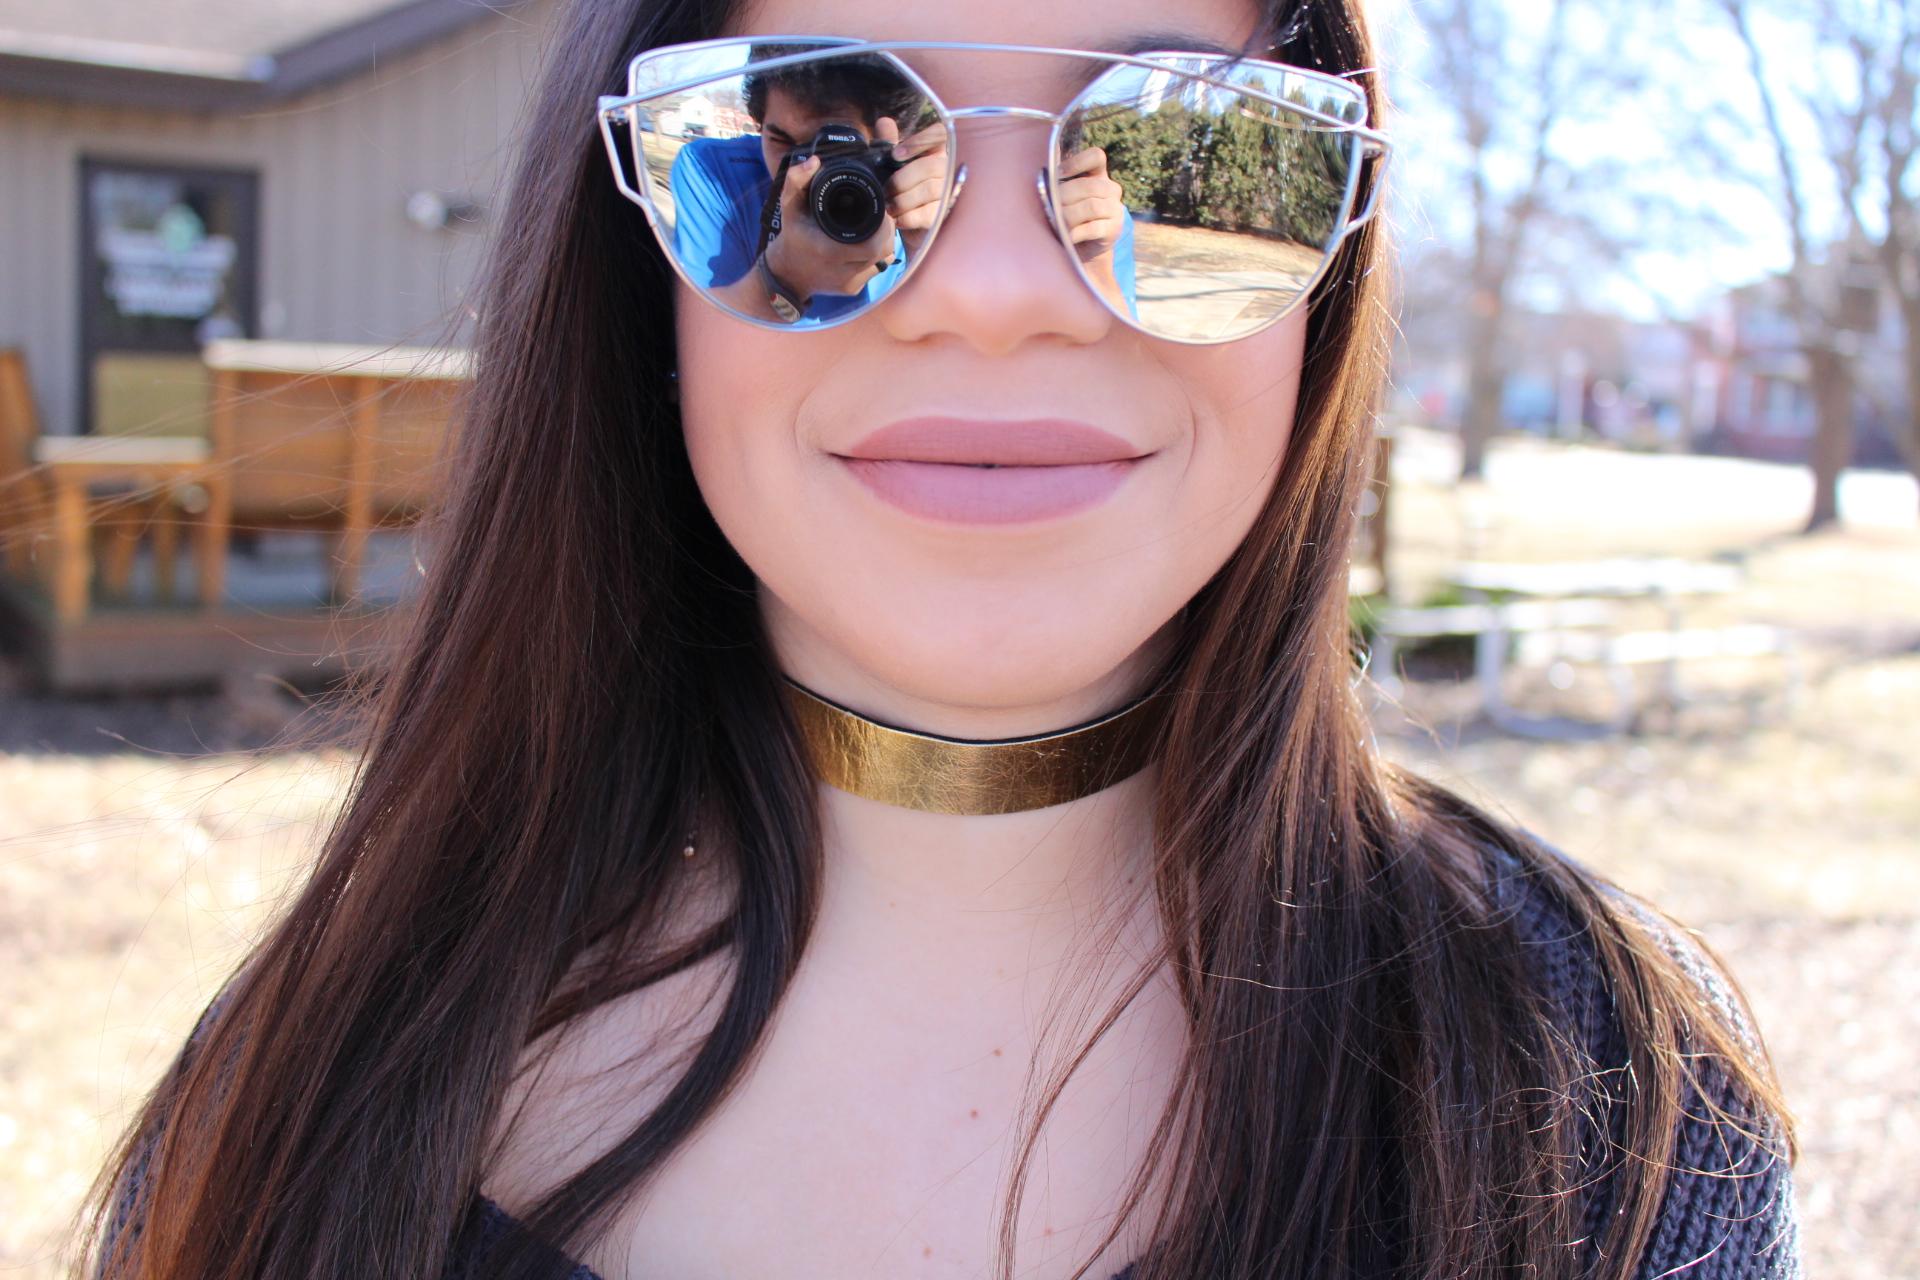 outfit gray sweater twited back burgundy jeans michael kors mk quay sunglasses by alejandra avila